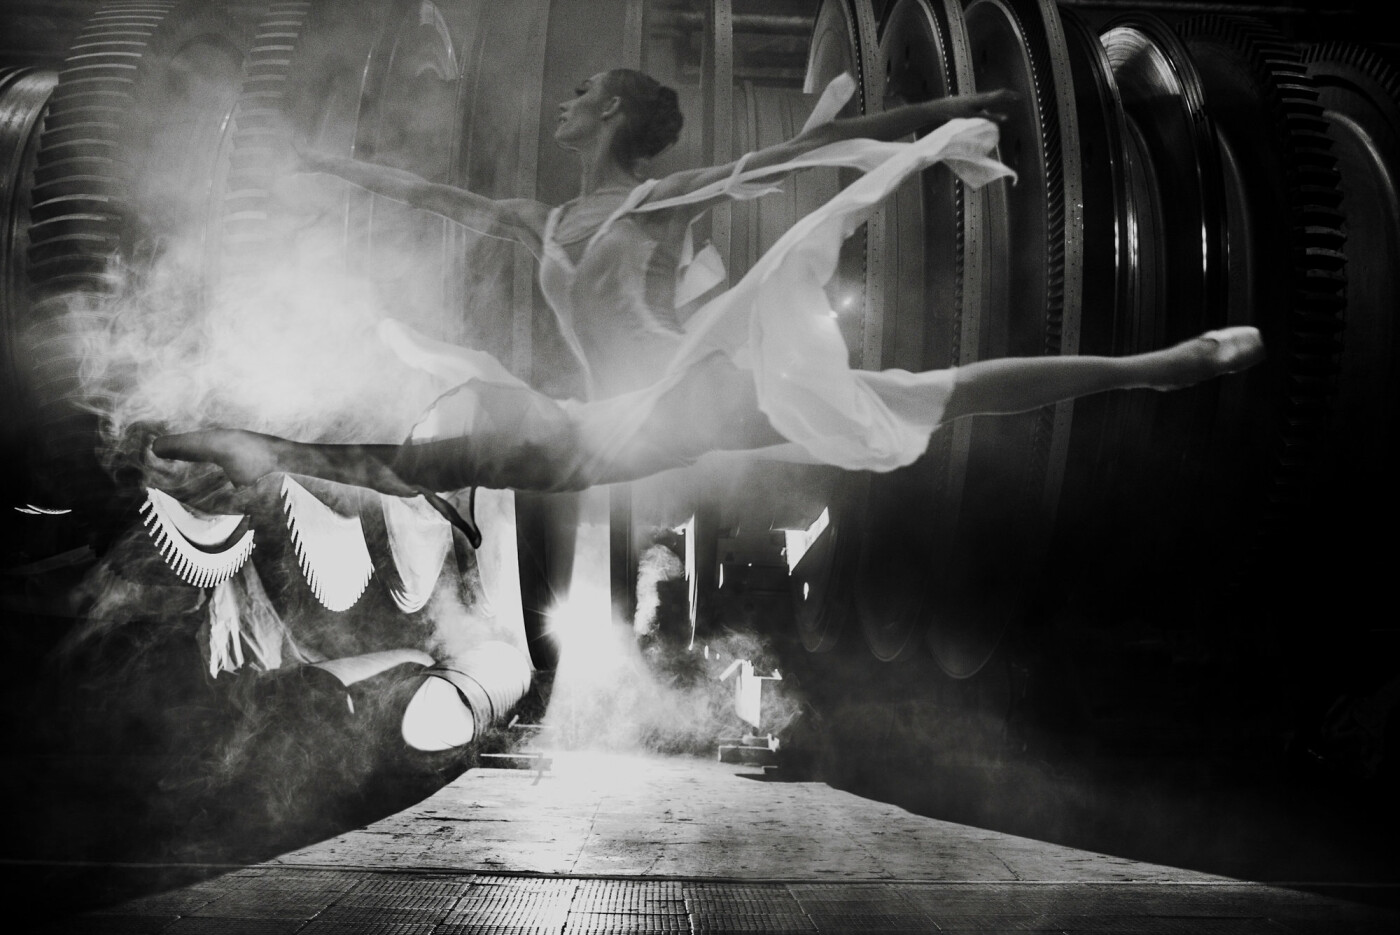 """Кочующий"" театр и 20 лет строительства: история ХНАТОБа за 5 минут, - ФОТО, фото-3"